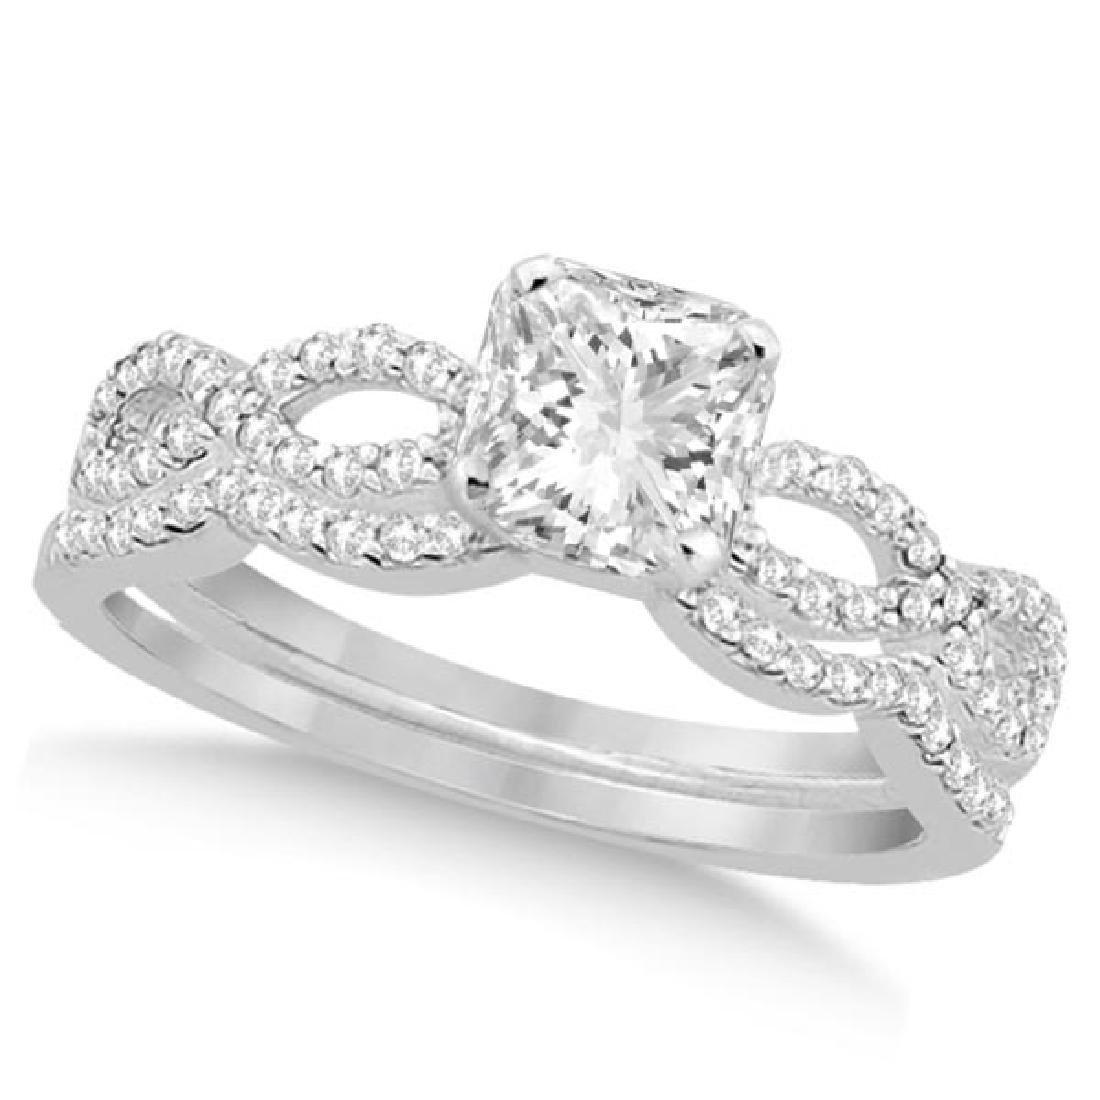 Infinity Princess Cut Diamond Bridal Ring Set 14k White